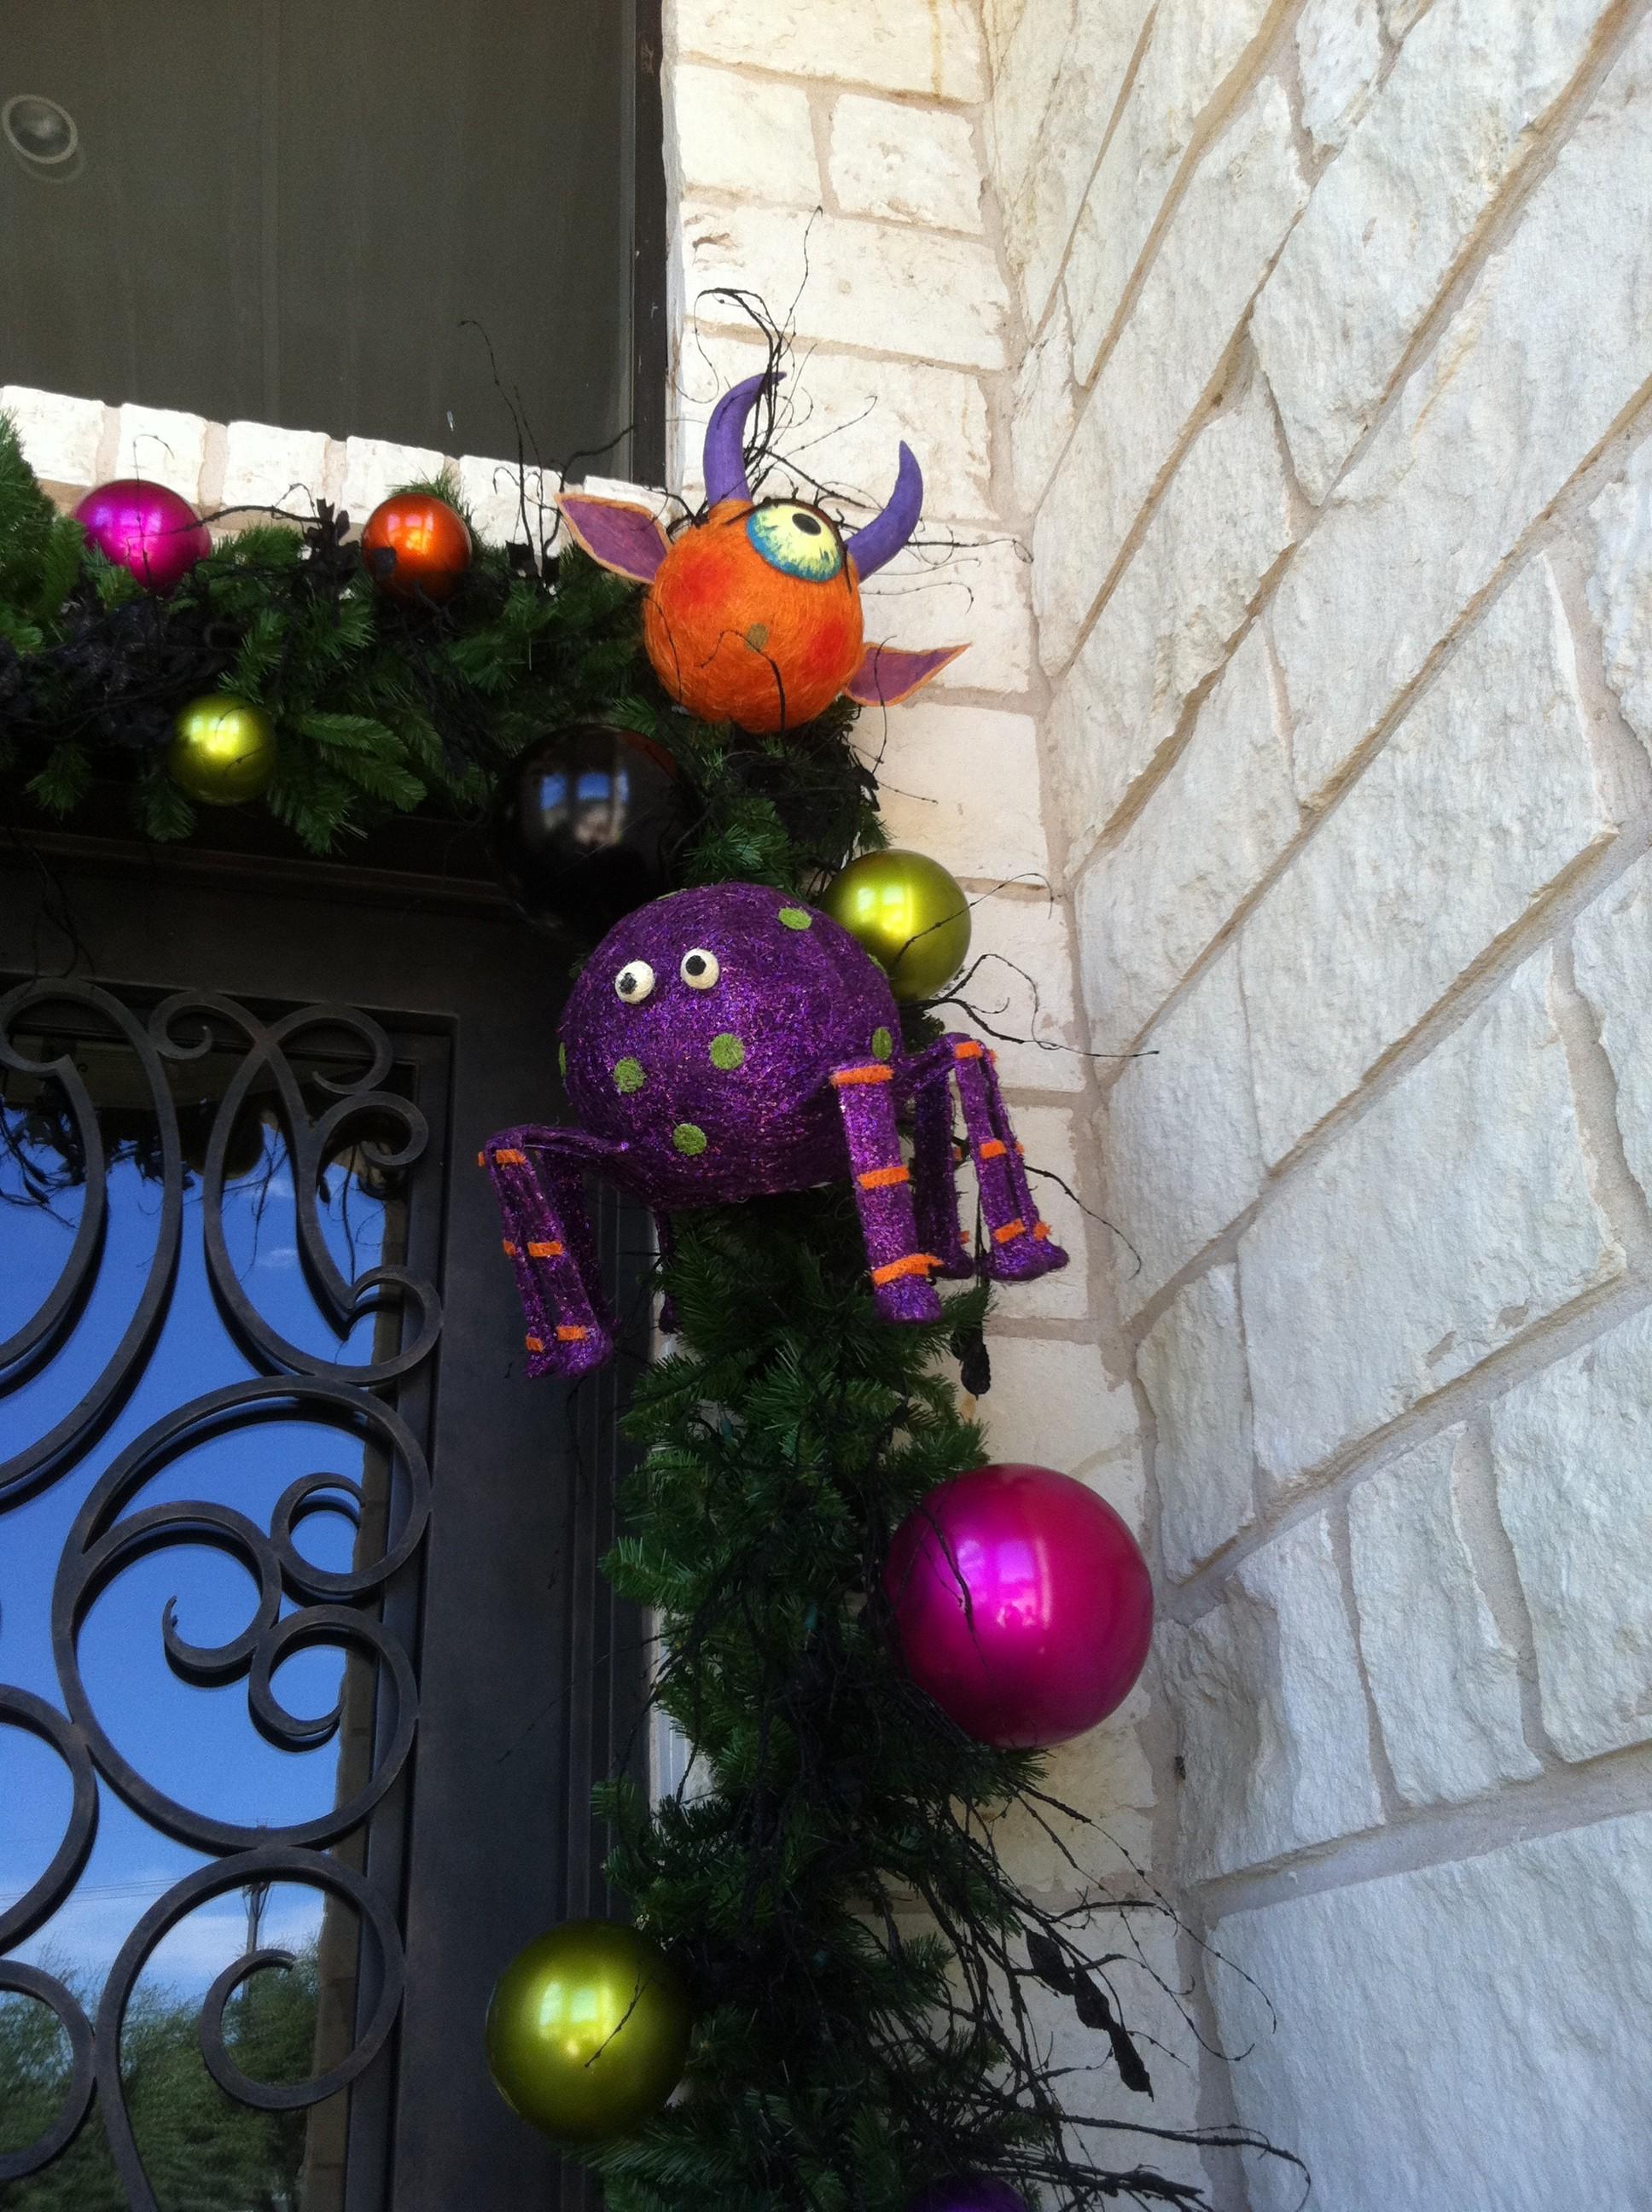 Show Me a Frightfully Fun Halloween Garland! Show Me - Show Me Halloween Decorations